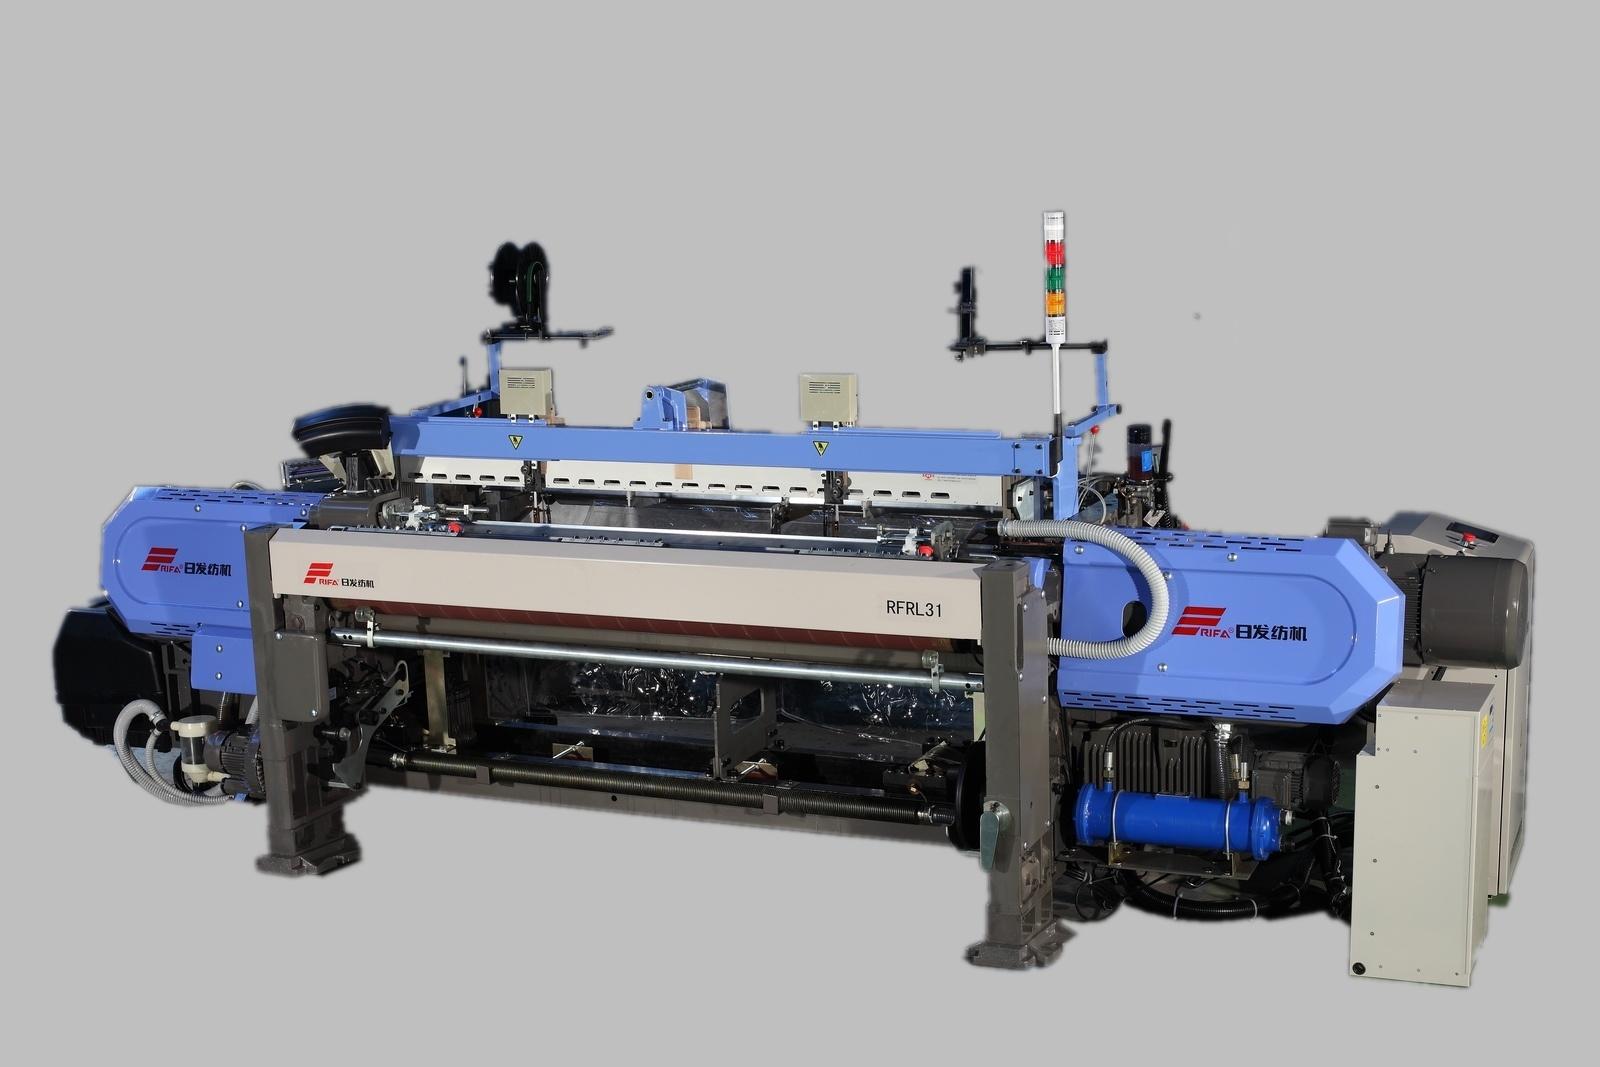 High-Speed Rapier Loom (RFRL31)